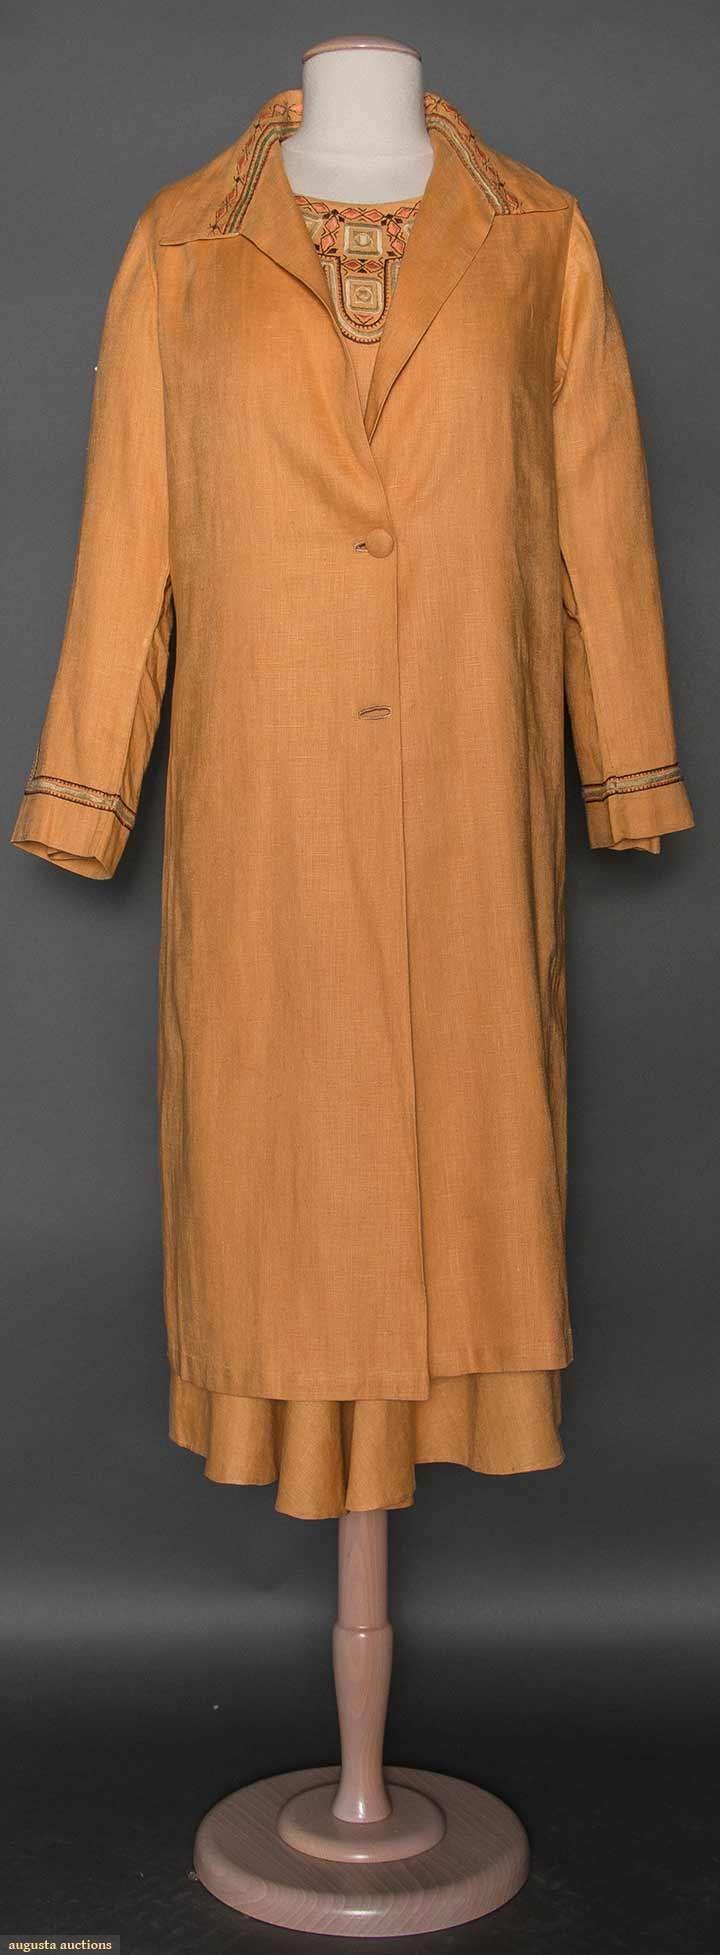 Apricot Linen Day Dress & Coat, C. 1928